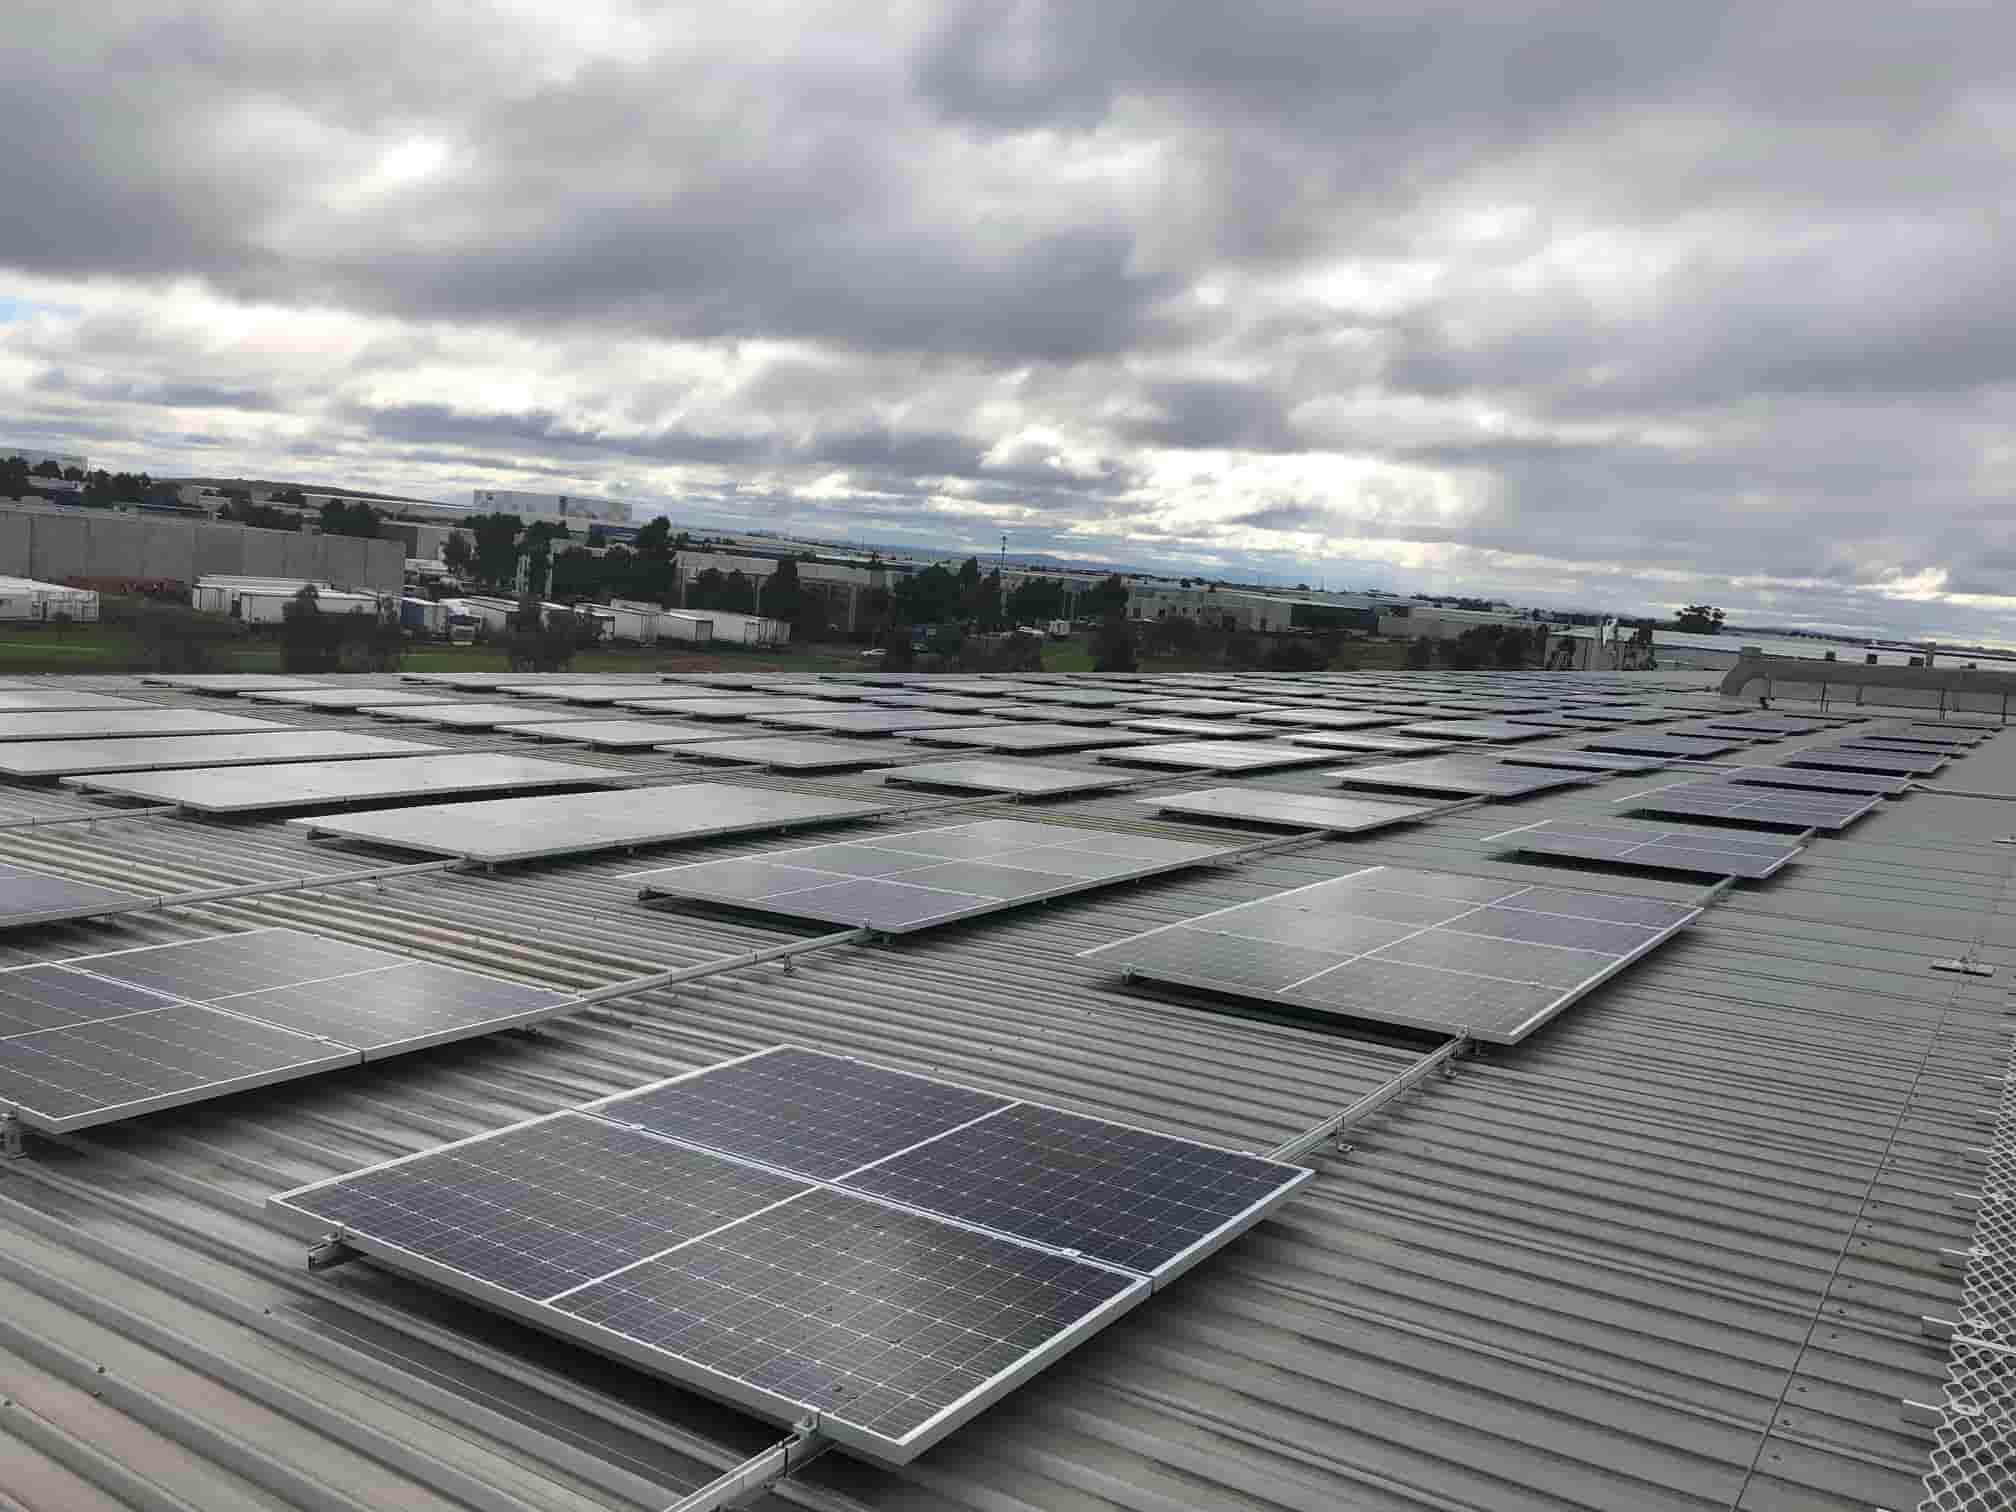 A view of CHEP Australia's solar energy panels